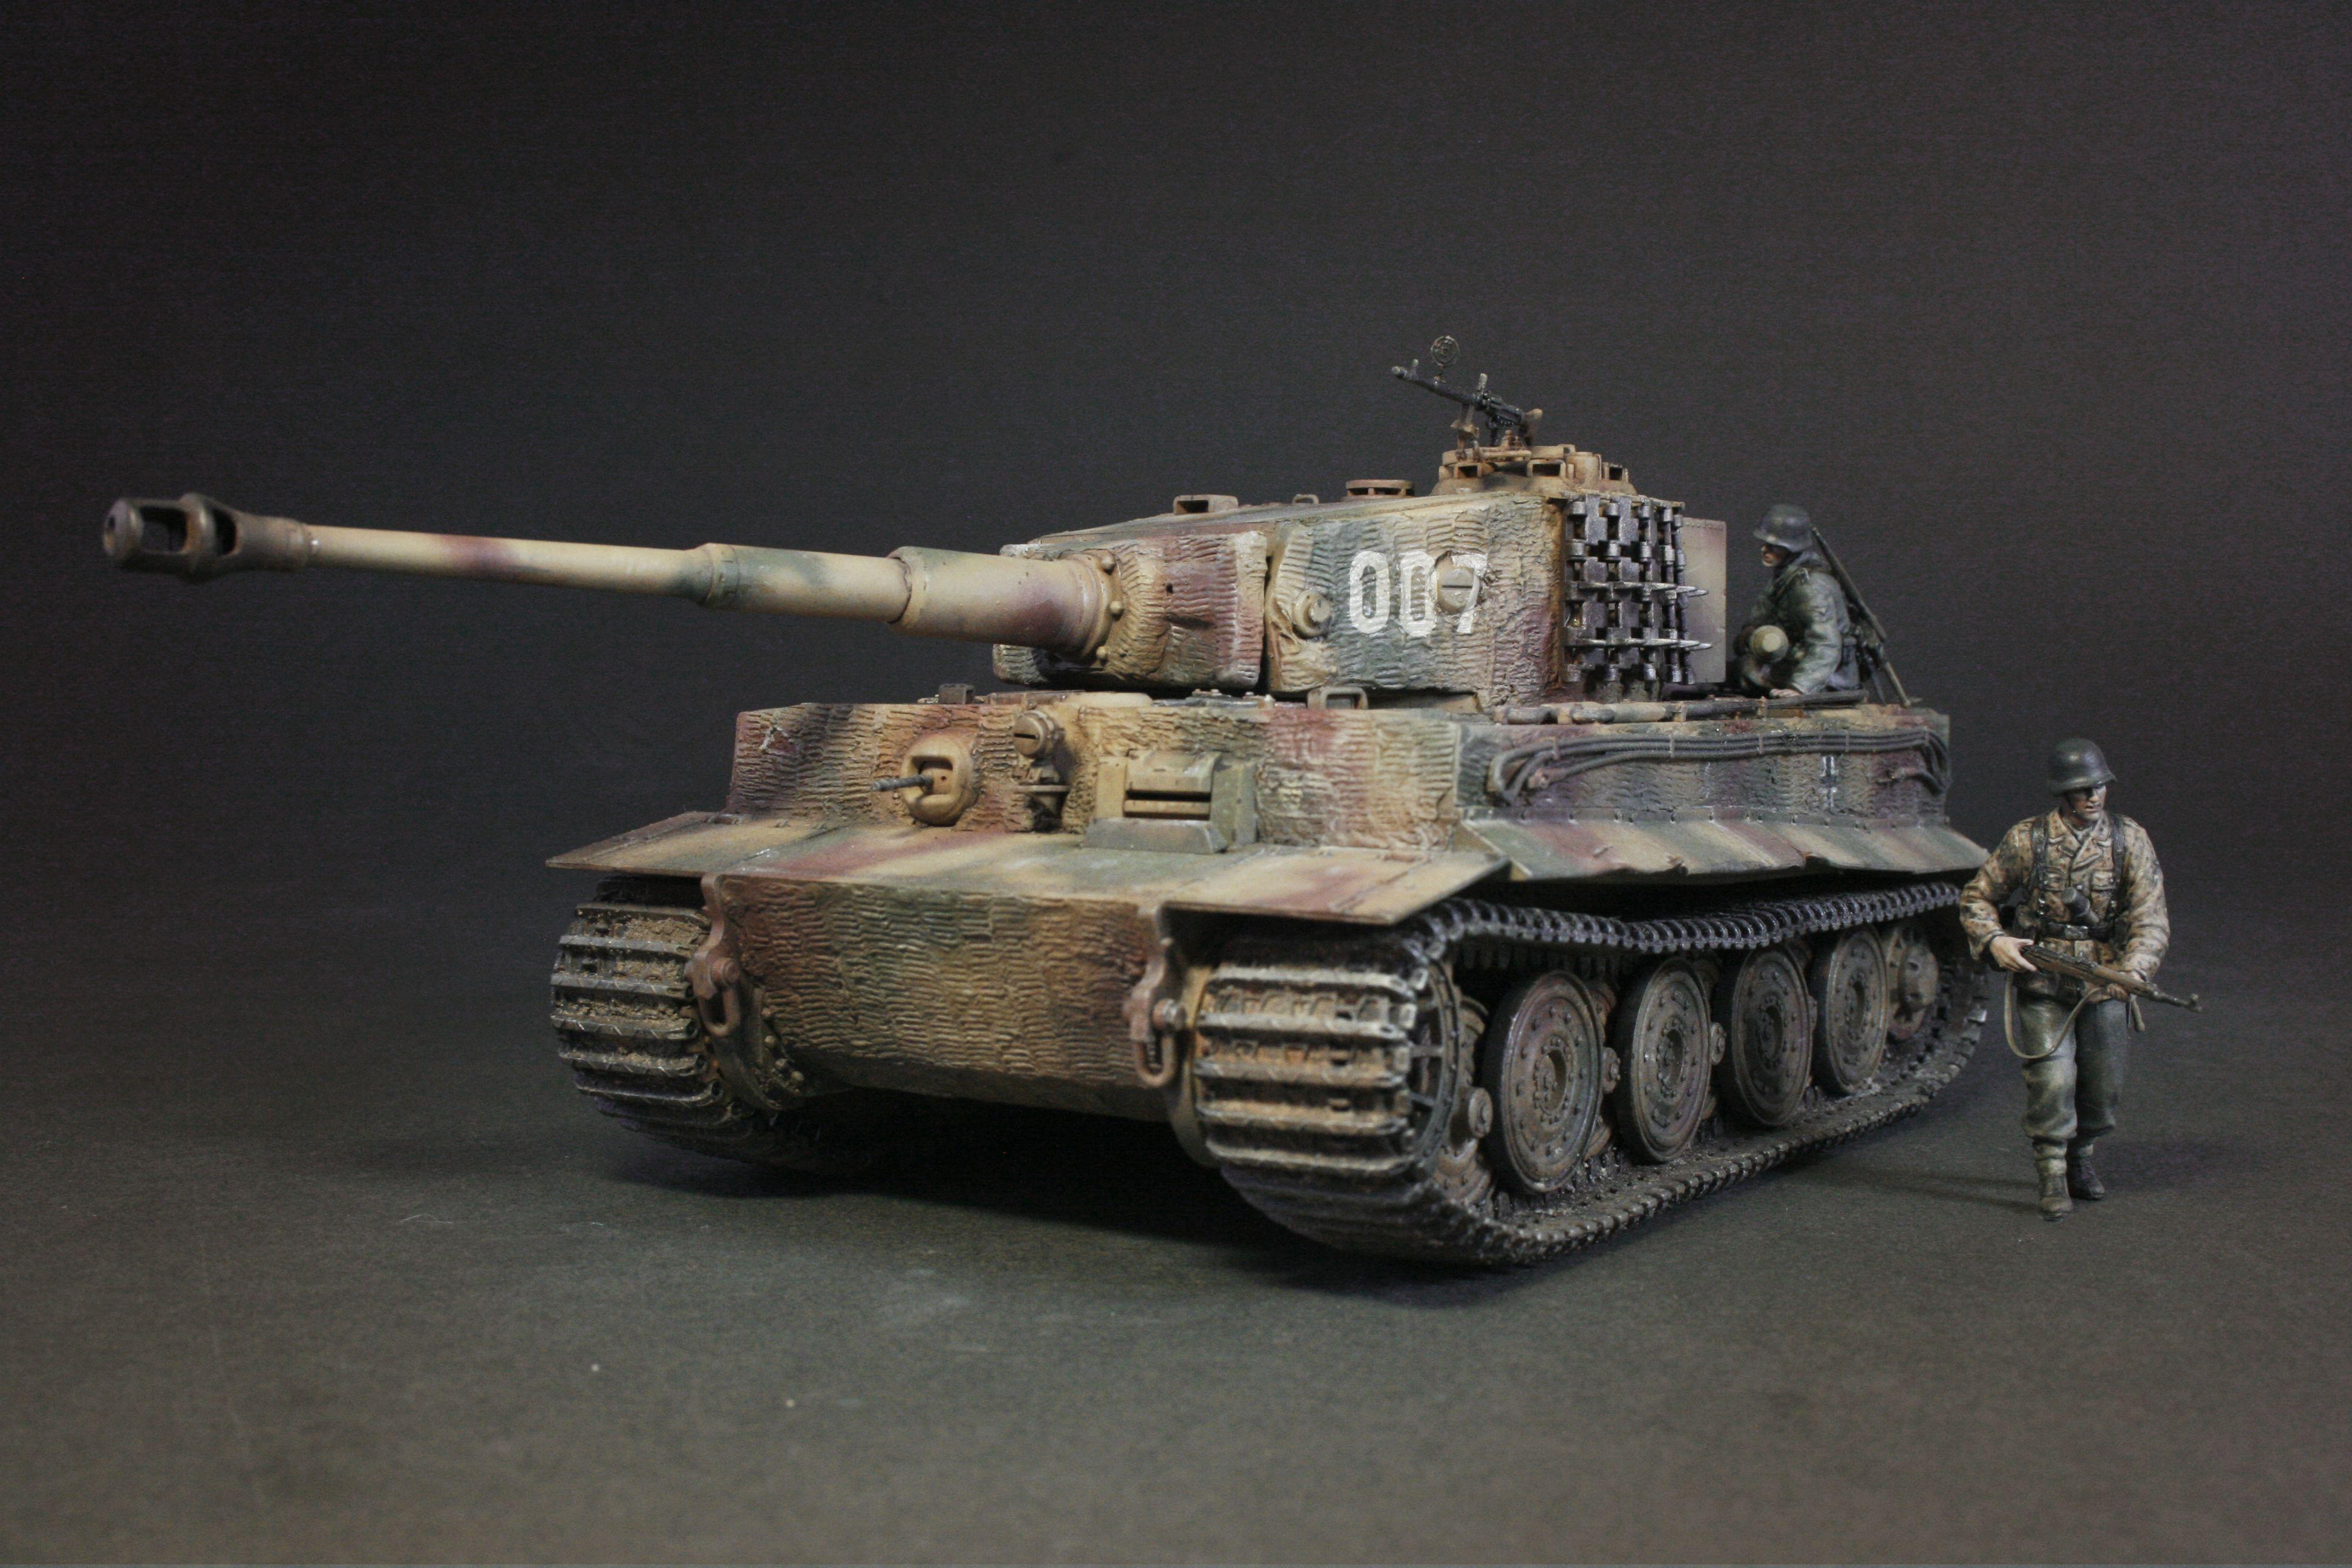 AFV - German Pz.kpfw VI TIGER I   Military vehicles